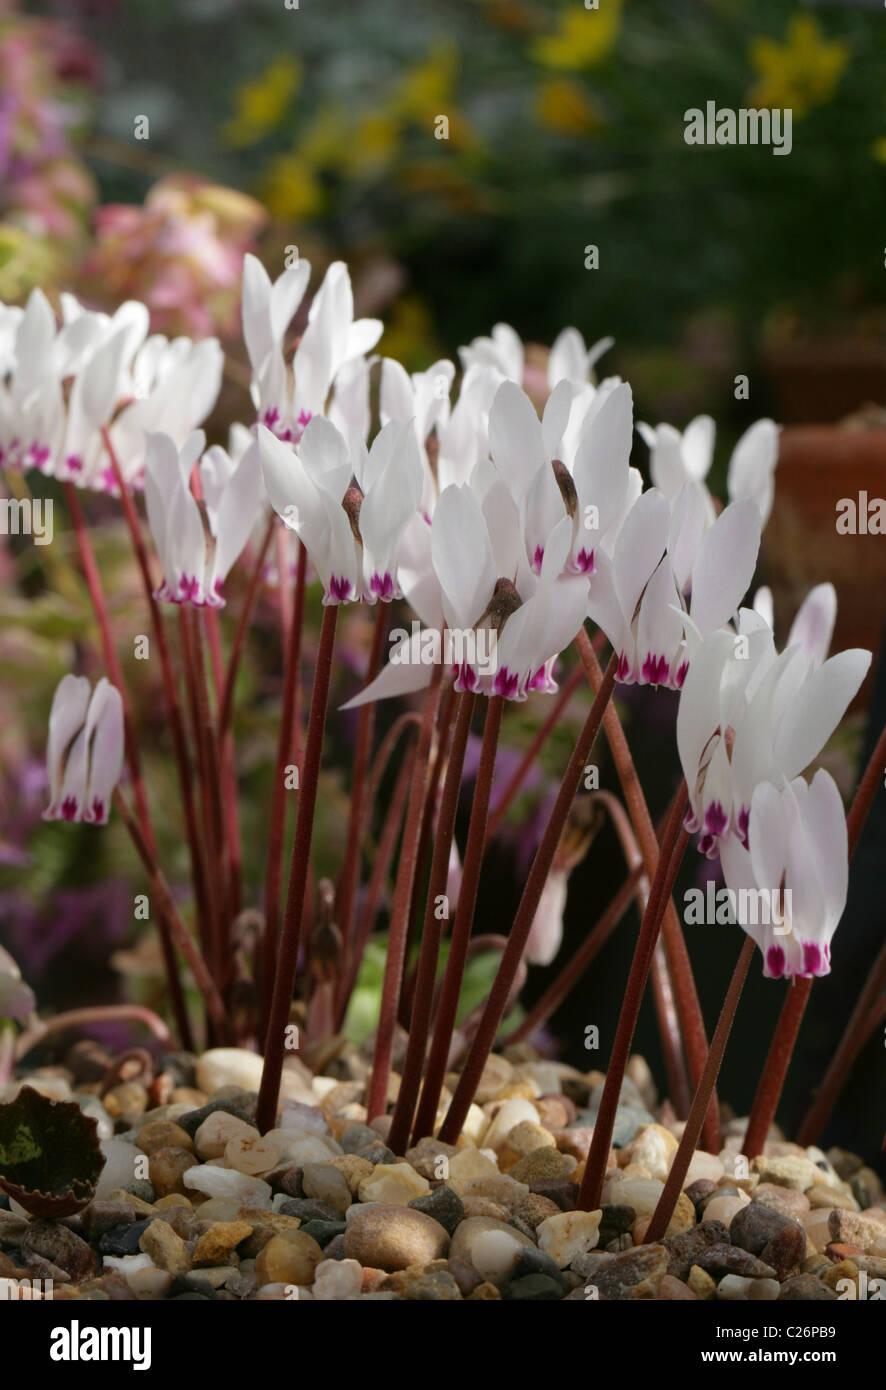 Cyprus Cyclamen, Cyclamen cyprium, Myrsinaceae, Cyprus. - Stock Image